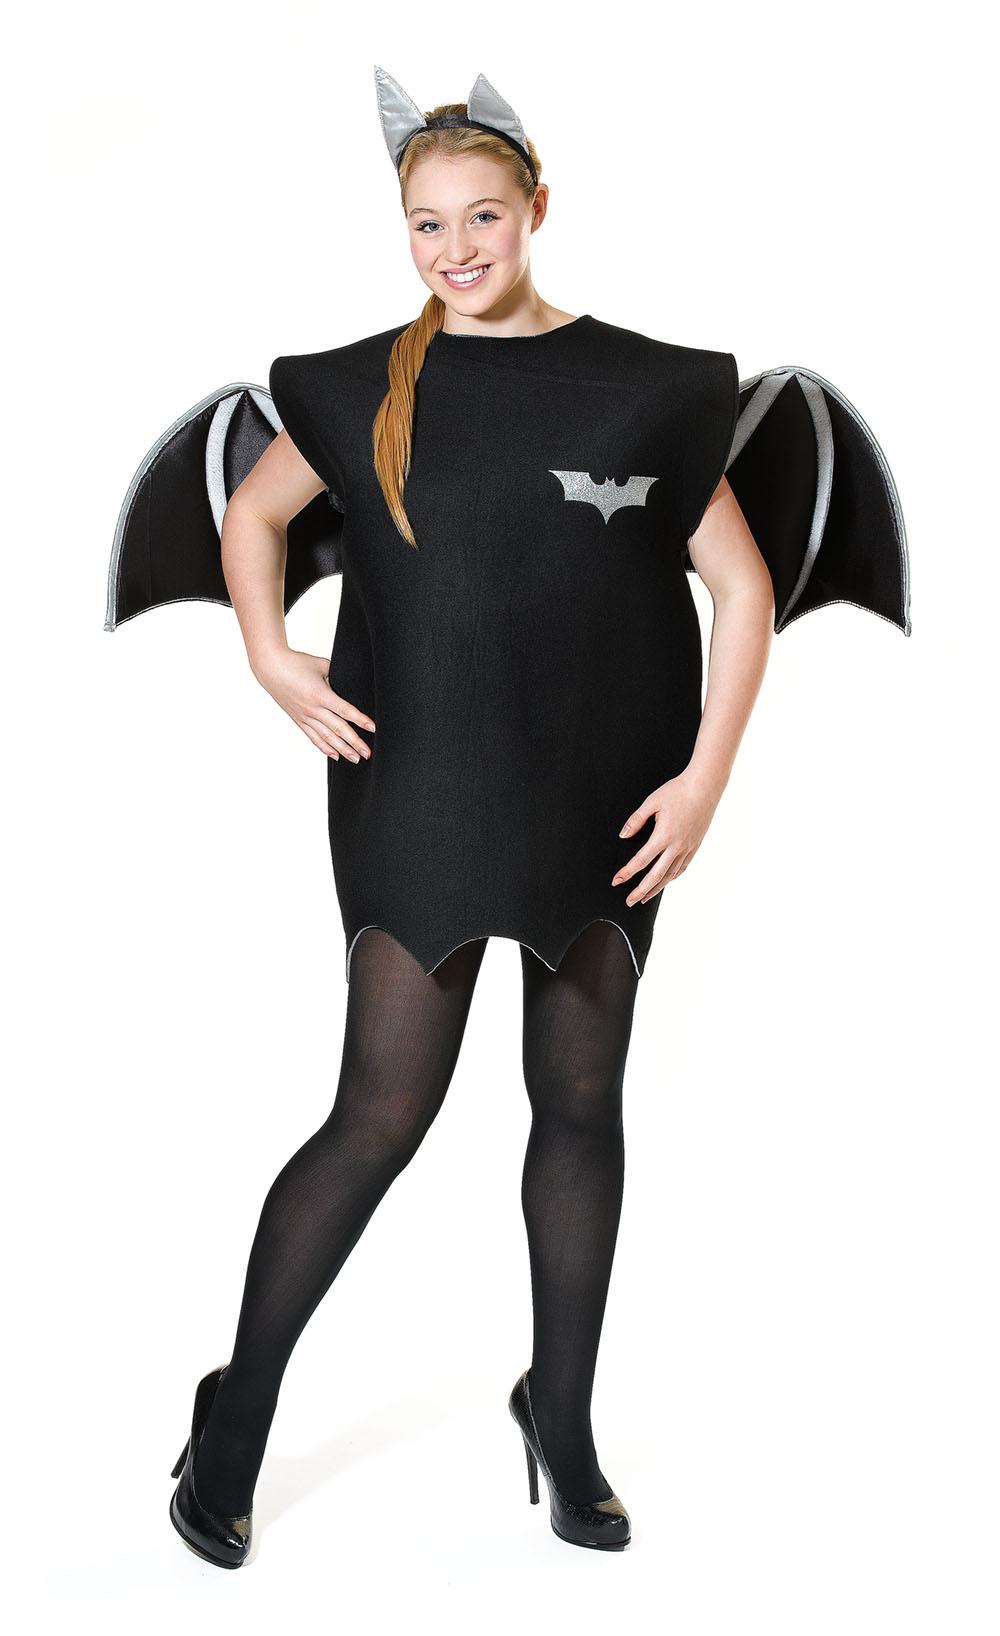 Ladies Bat Batwoman Black & Silver Fancy Dress Costume Halloween Outfit UK 10-14